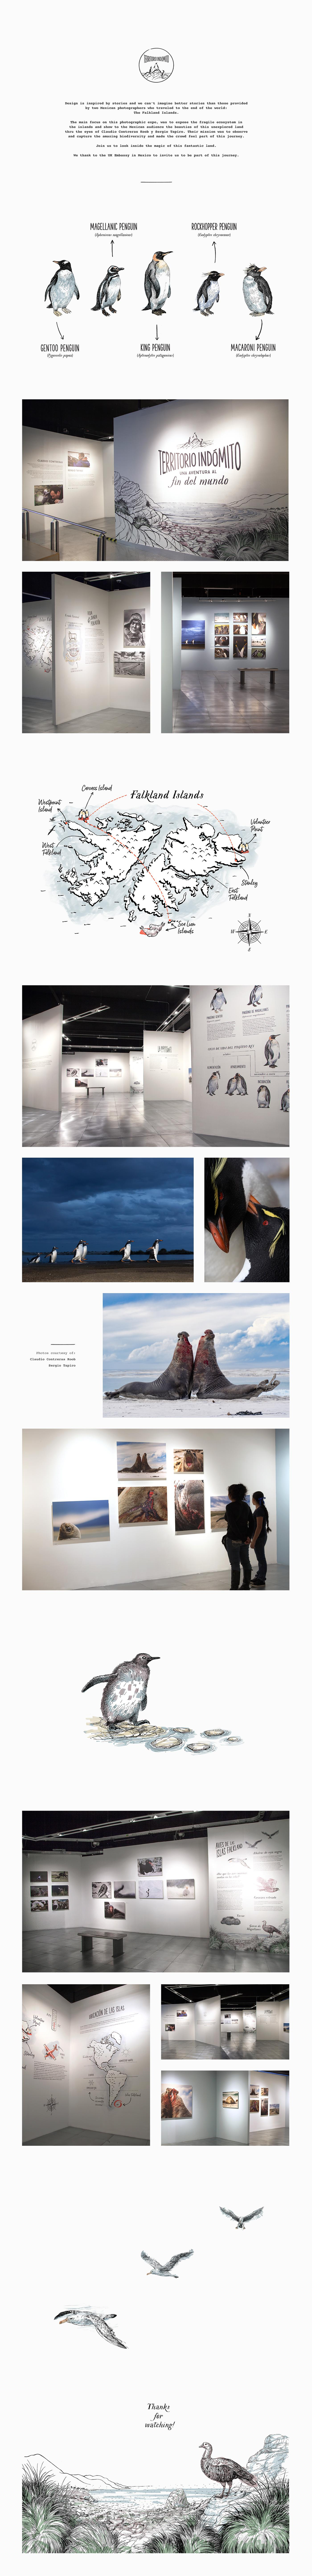 Exhibition  Falkland Islands penguins nature photography museography universum infographics mexico